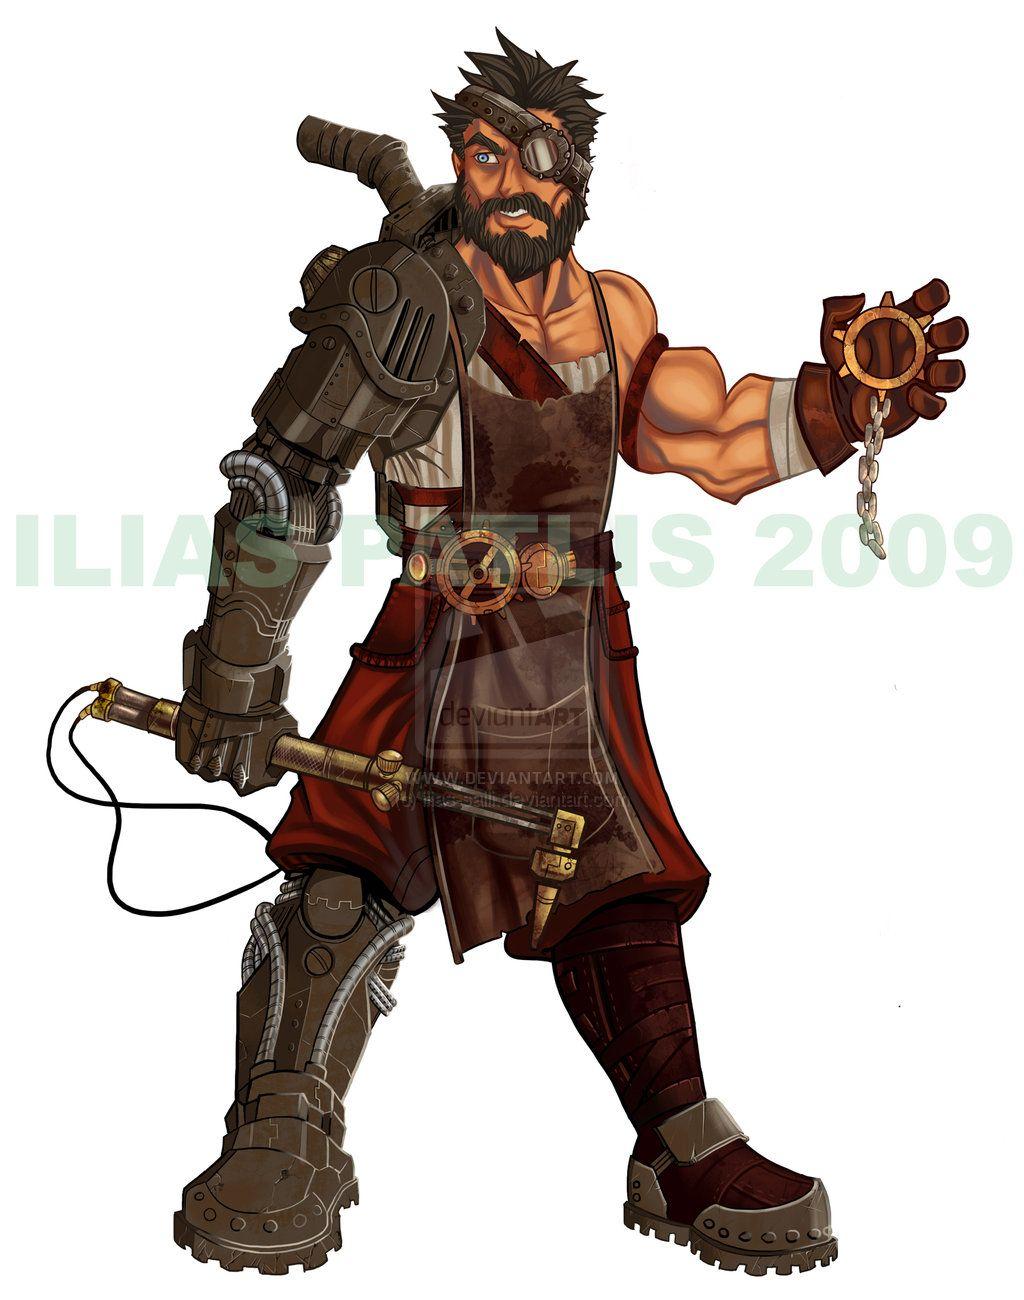 steampunk characters male - Google Search | digital ...  steampunk chara...